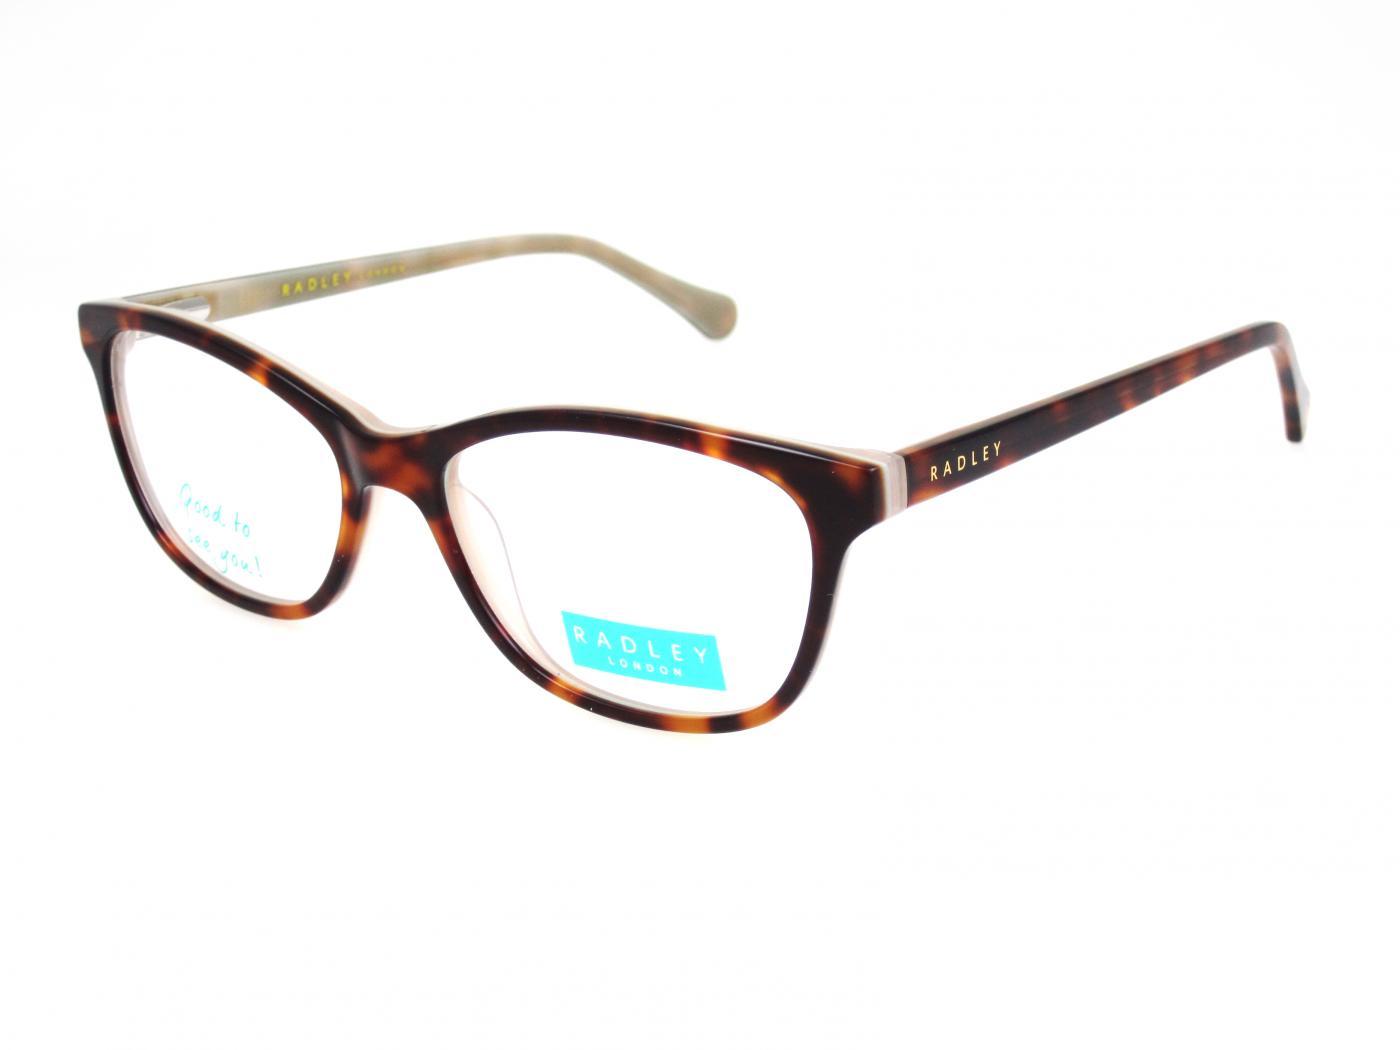 Dámske dioptrické okuliare Radley London 563938ec69b